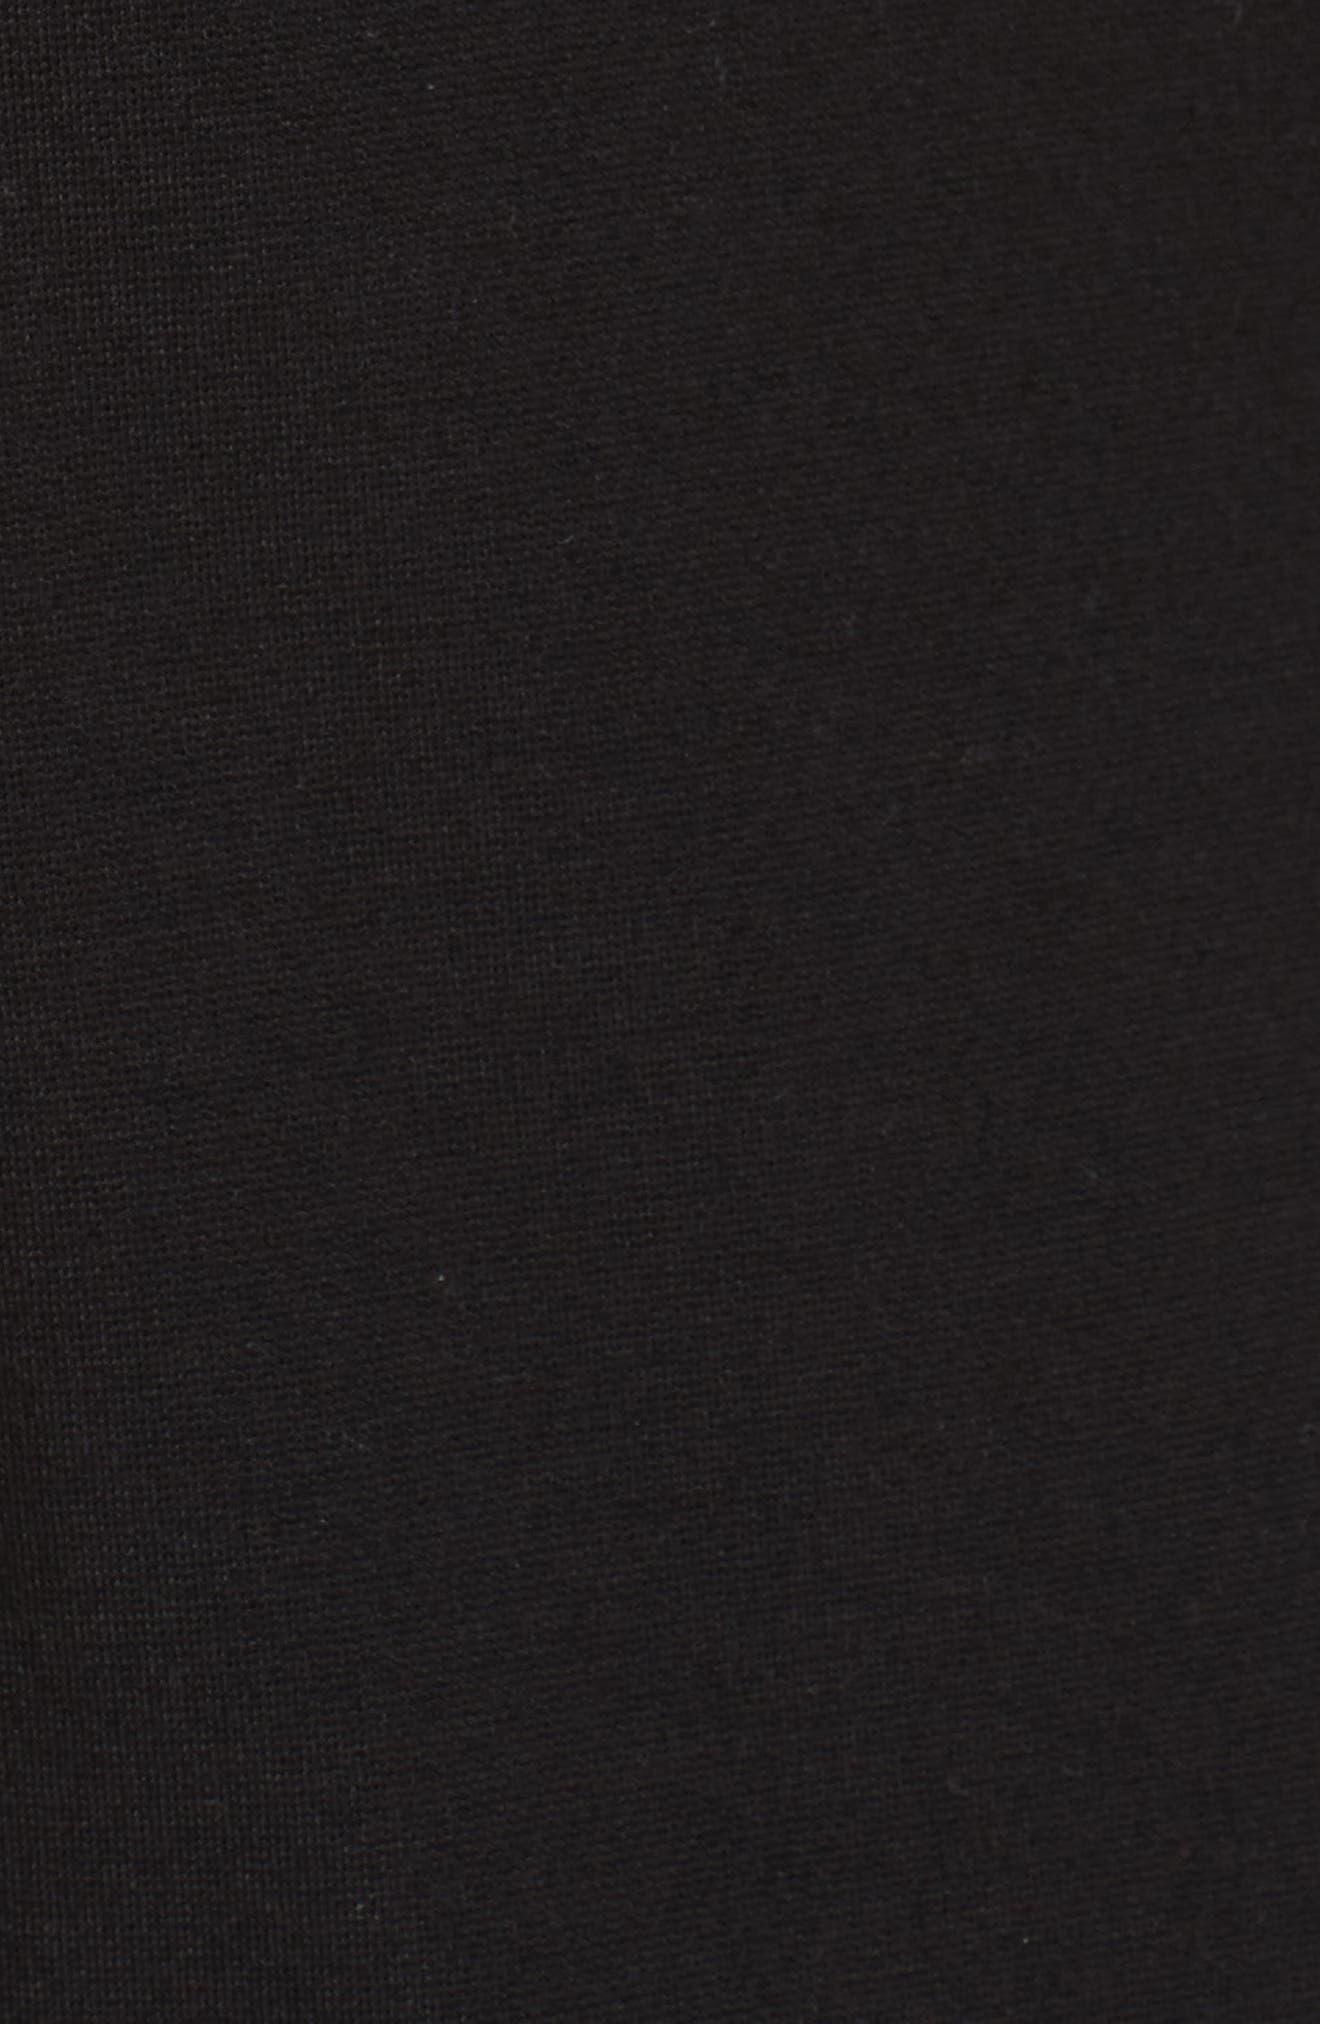 Lace Trim Sheath Dress,                             Alternate thumbnail 5, color,                             001